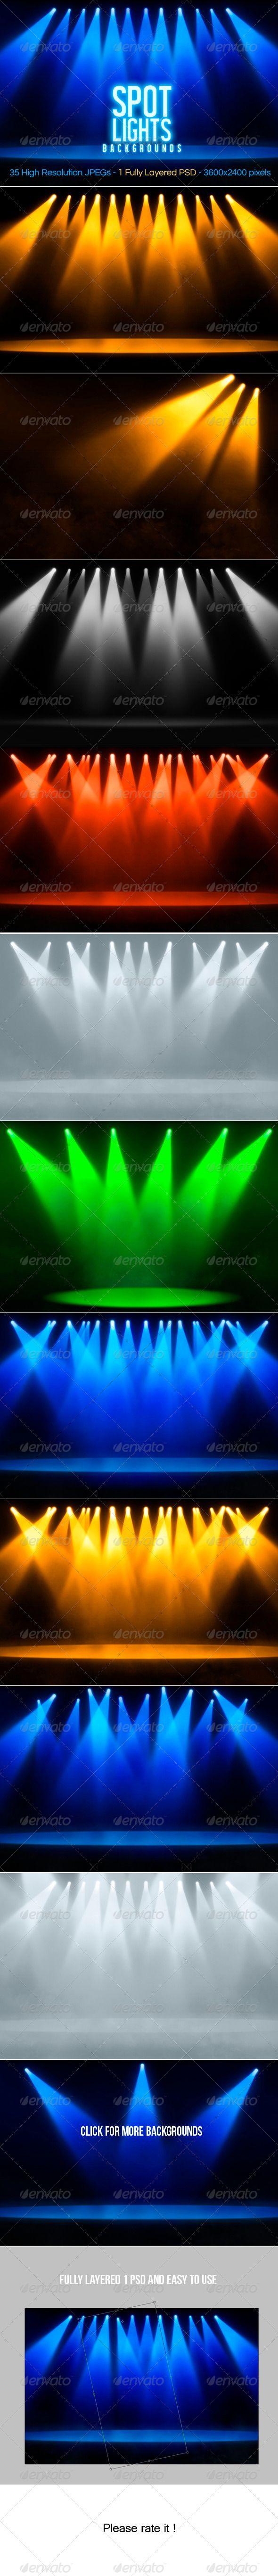 Spotlights Backgrounds